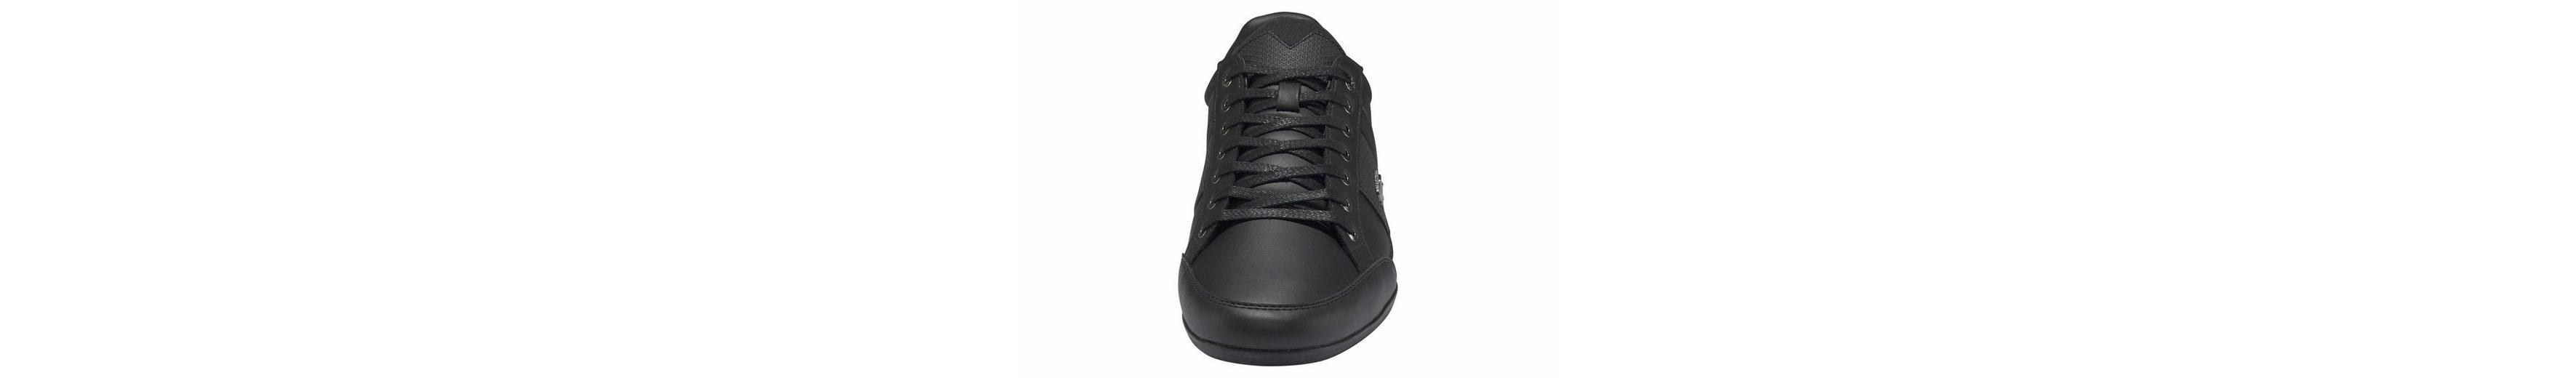 Lacoste Chaymon 118 1 CAM Sneaker Neue Online-Verkauf YACPidLVo